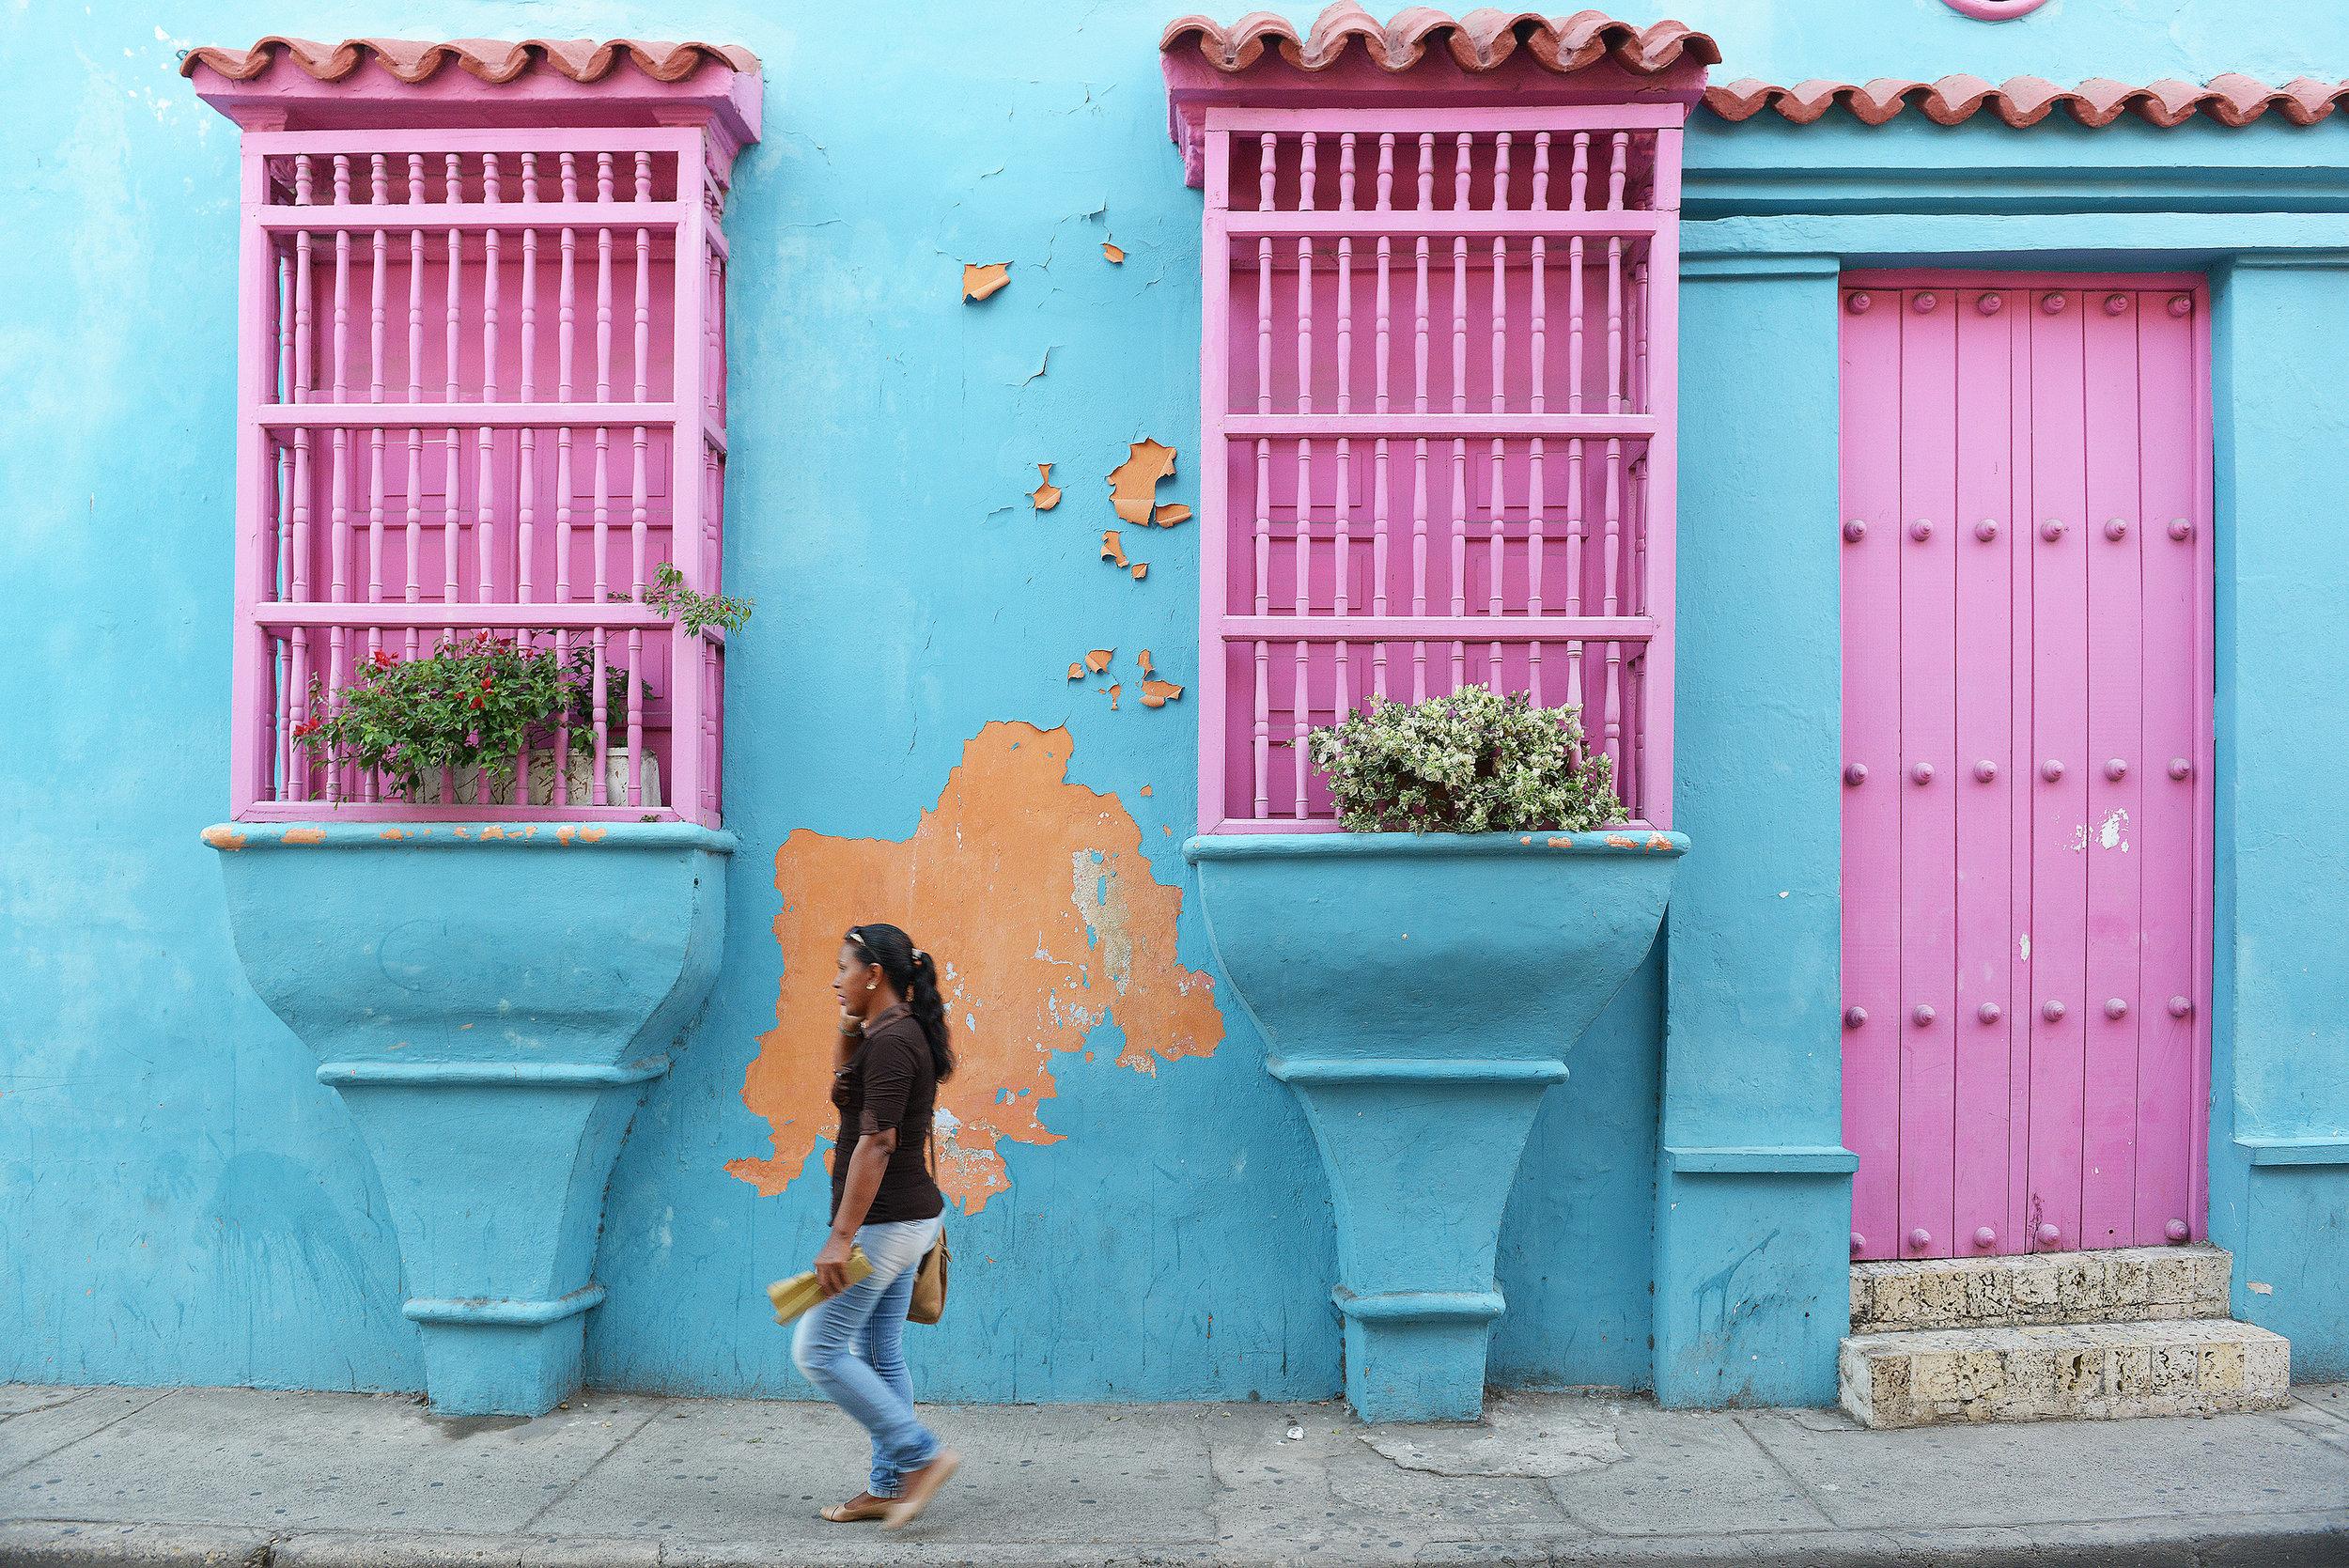 Cartagena, Kolombia, värit